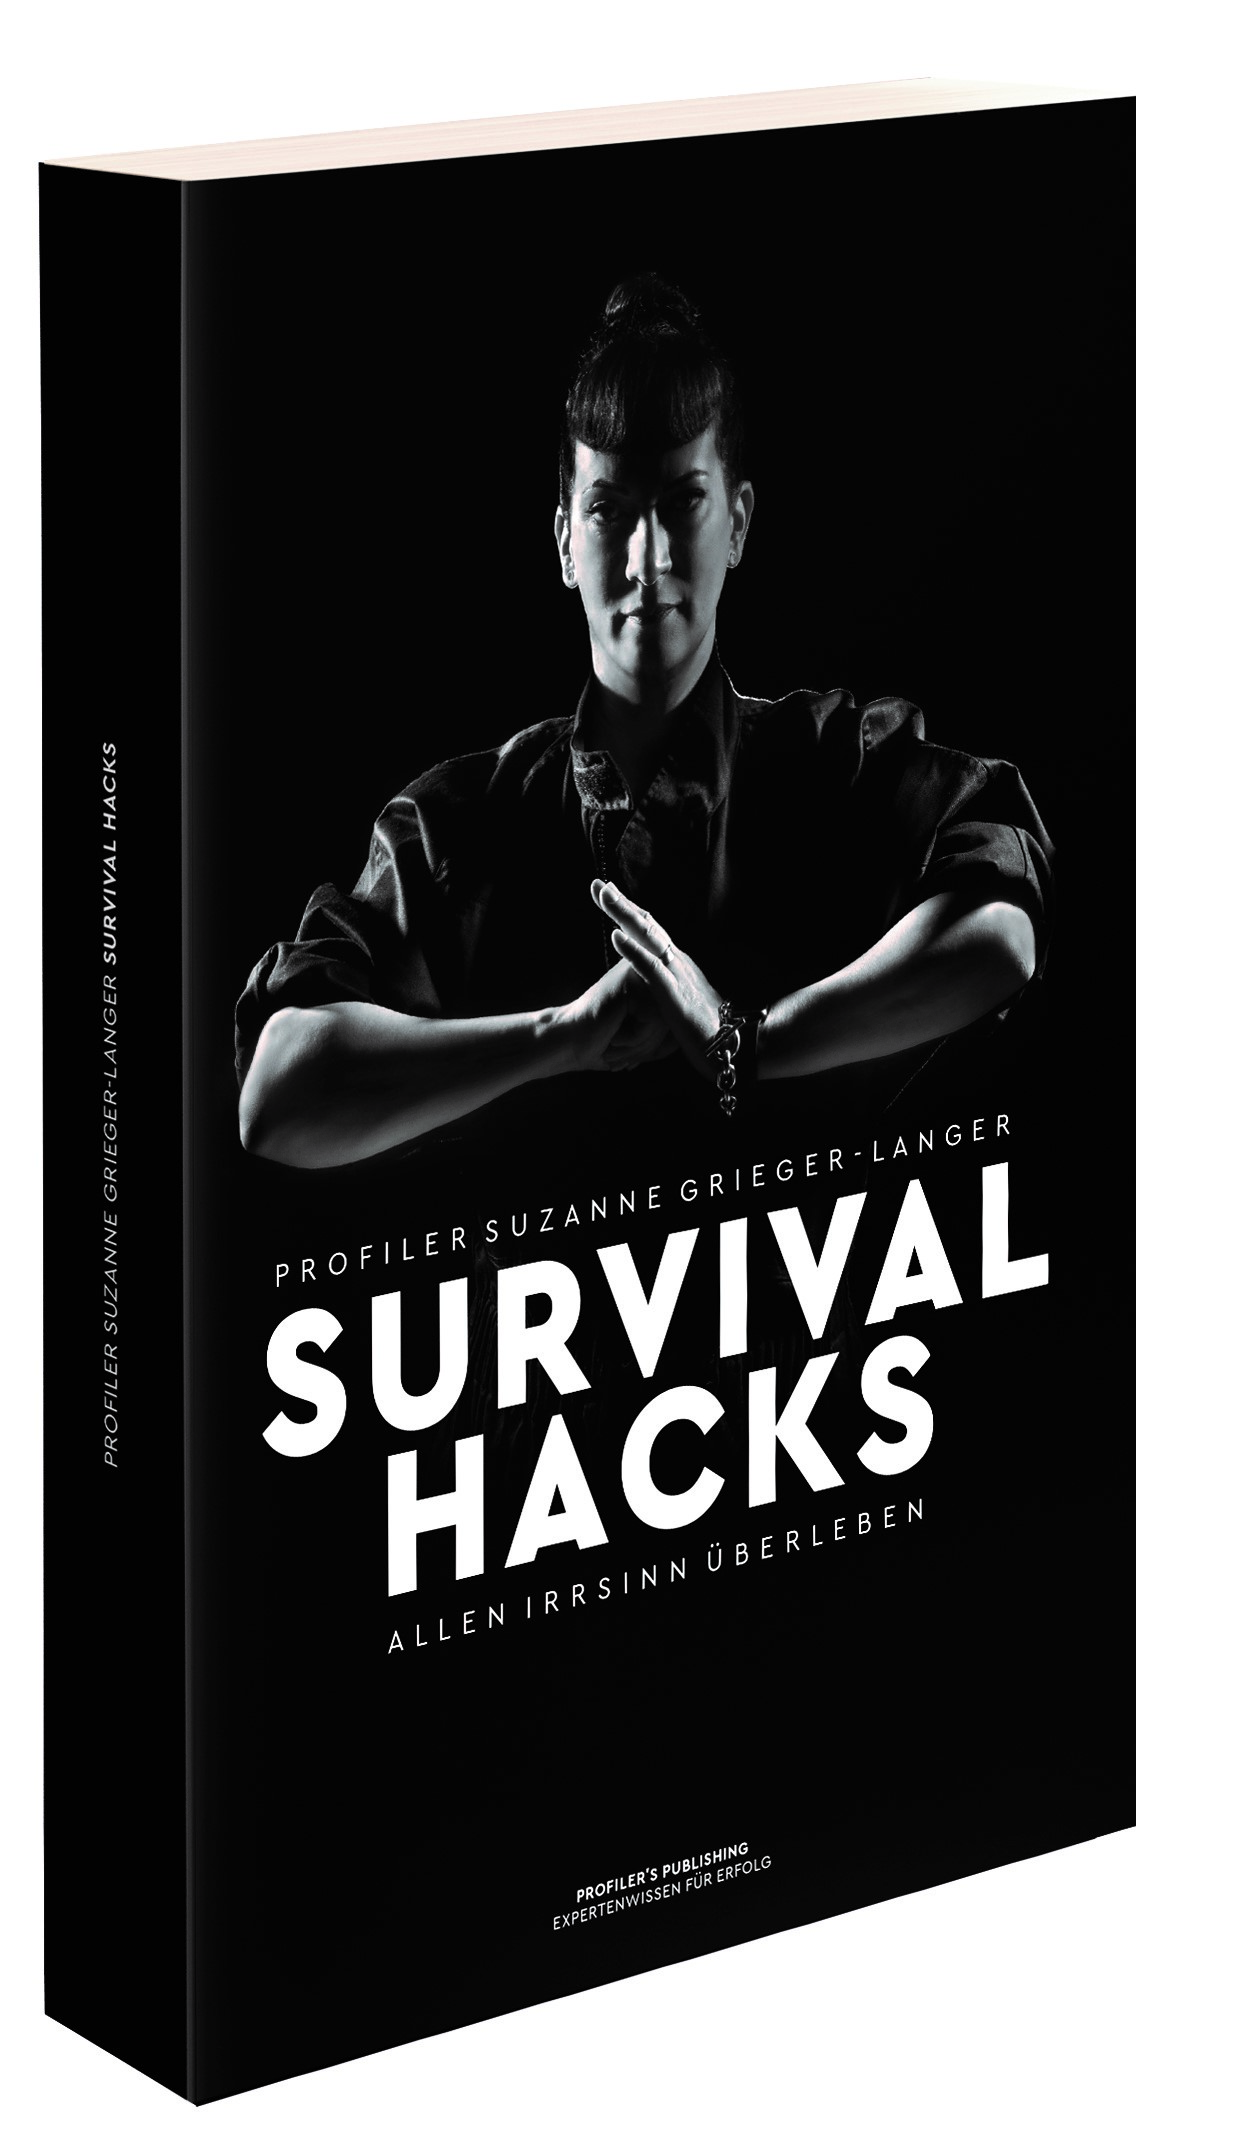 Expert Marketplace -  Suzanne Grieger-Langer - Survival Hacks – Allen Irrsinn überleben